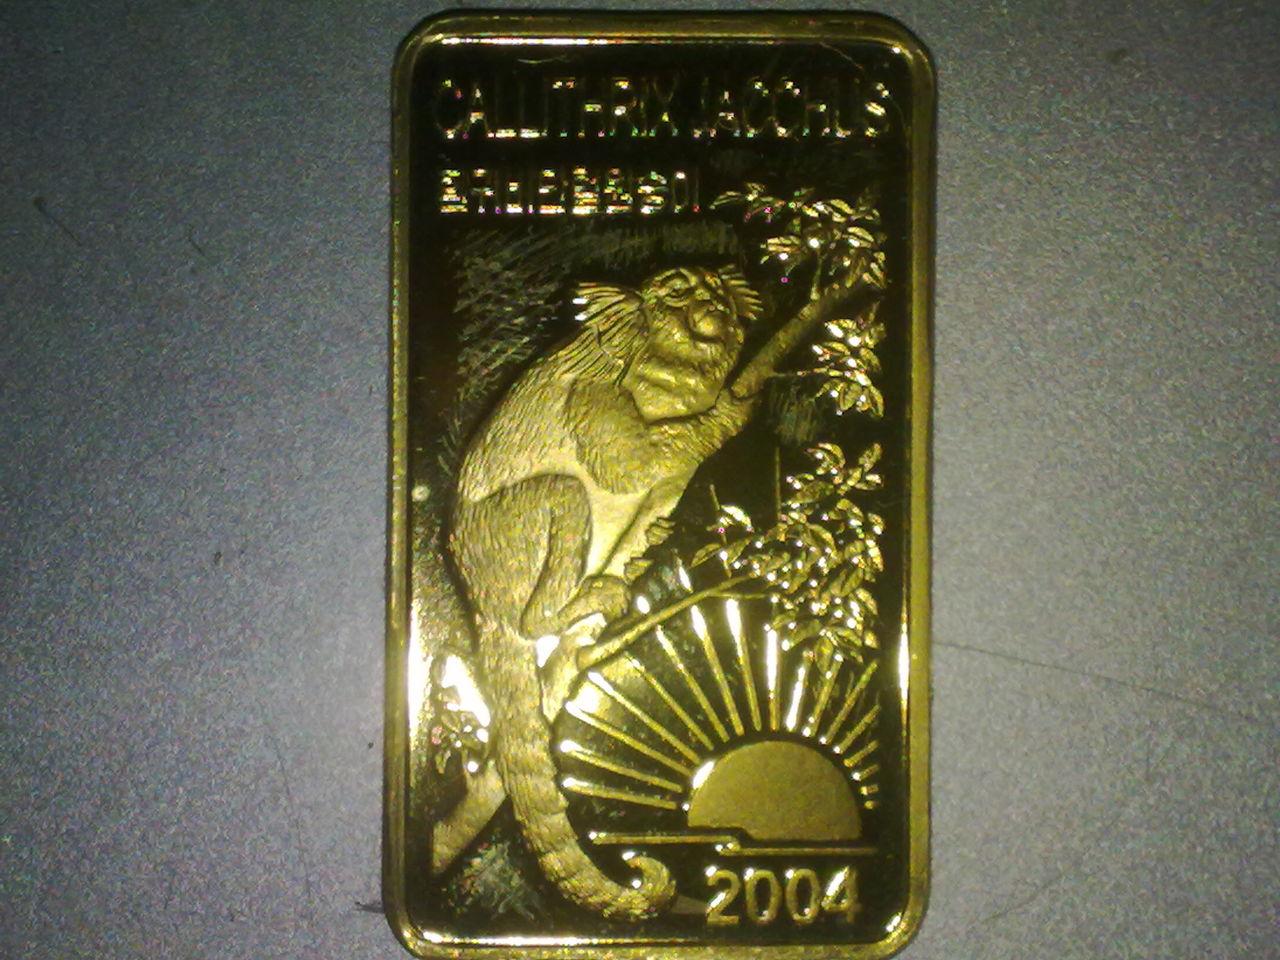 Monedas de Corea dedicadas a Emi... 009